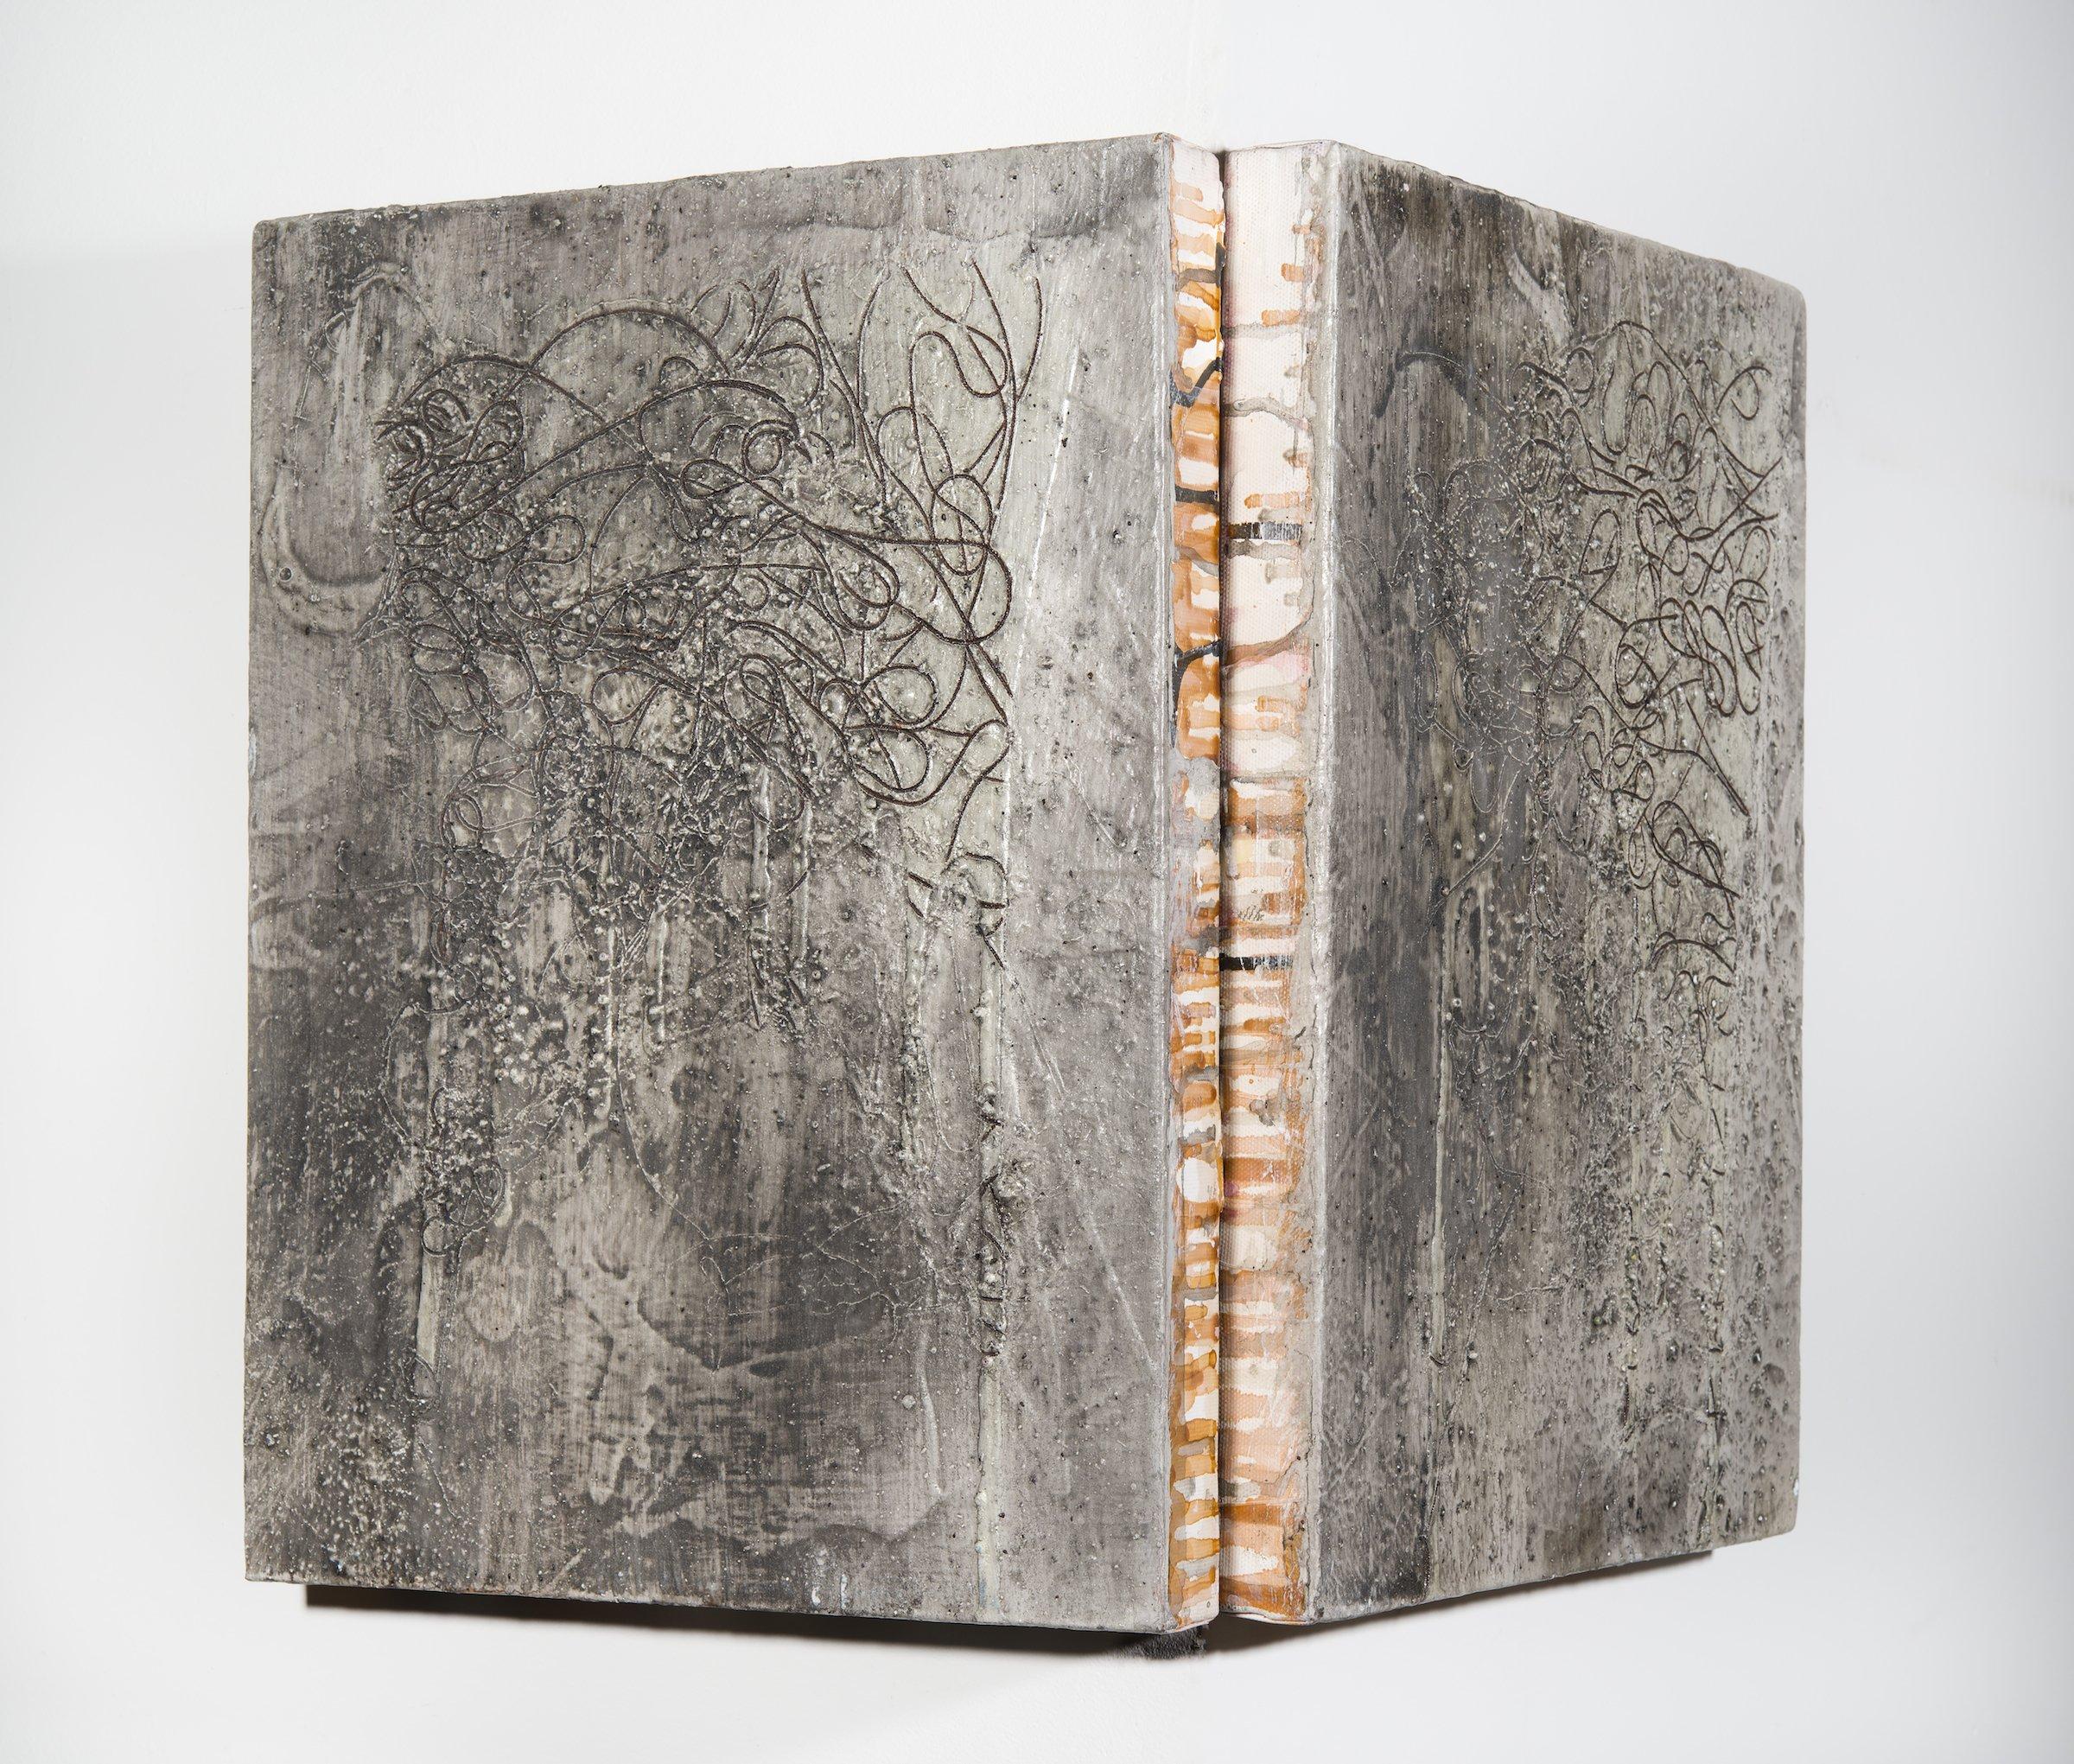 """Antashkaran"" by Antonio Puri, Mixed Media on Canvas, 2013, Mud Season Review"